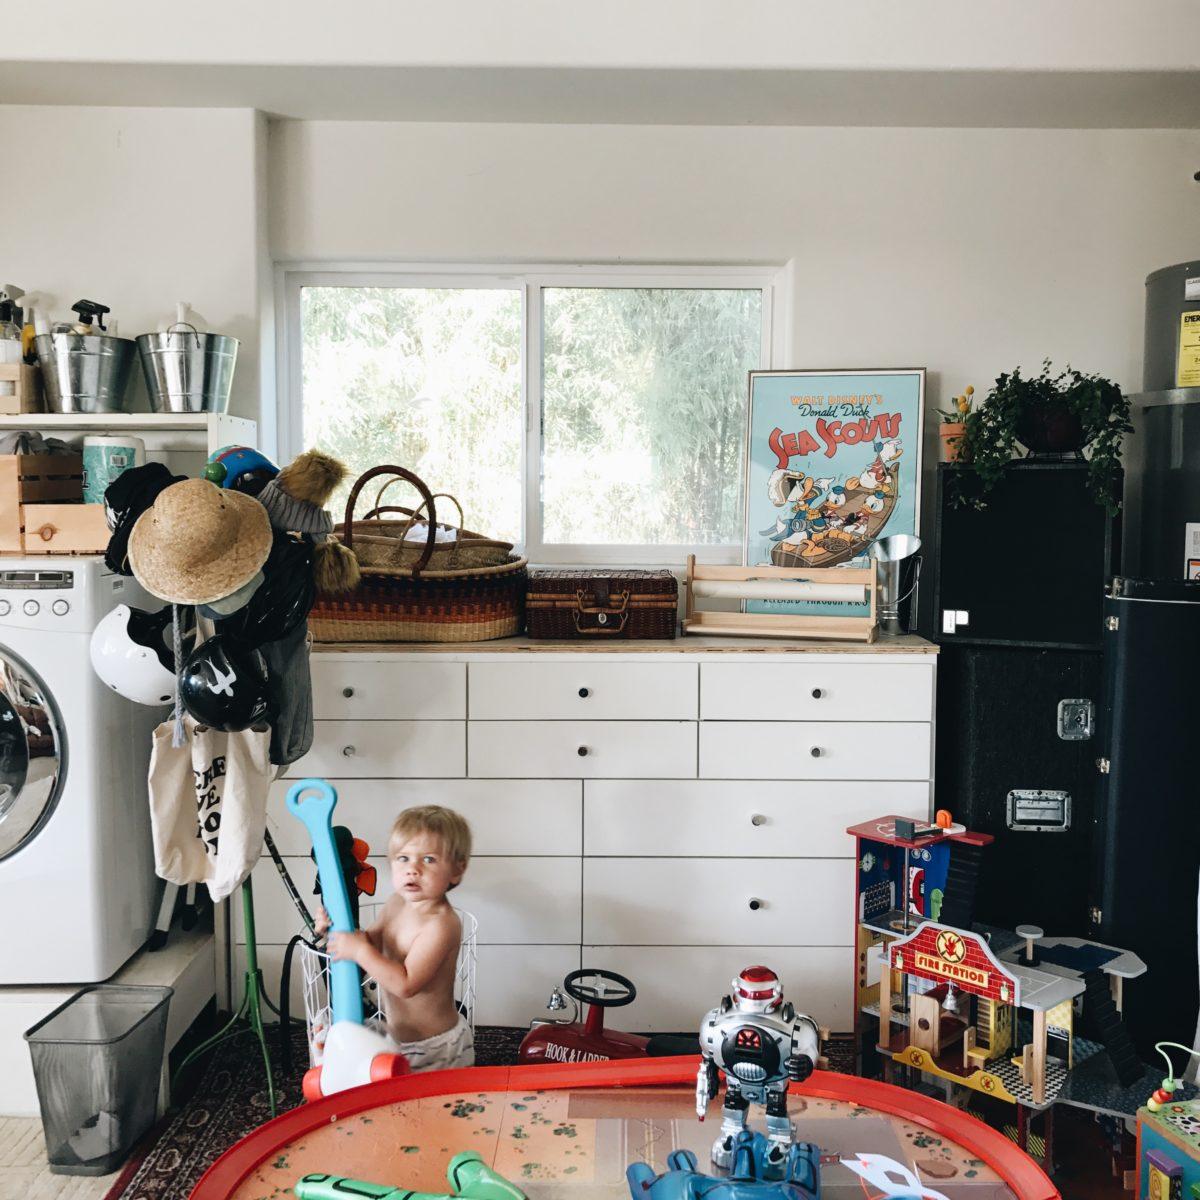 5 steps to an organized garage